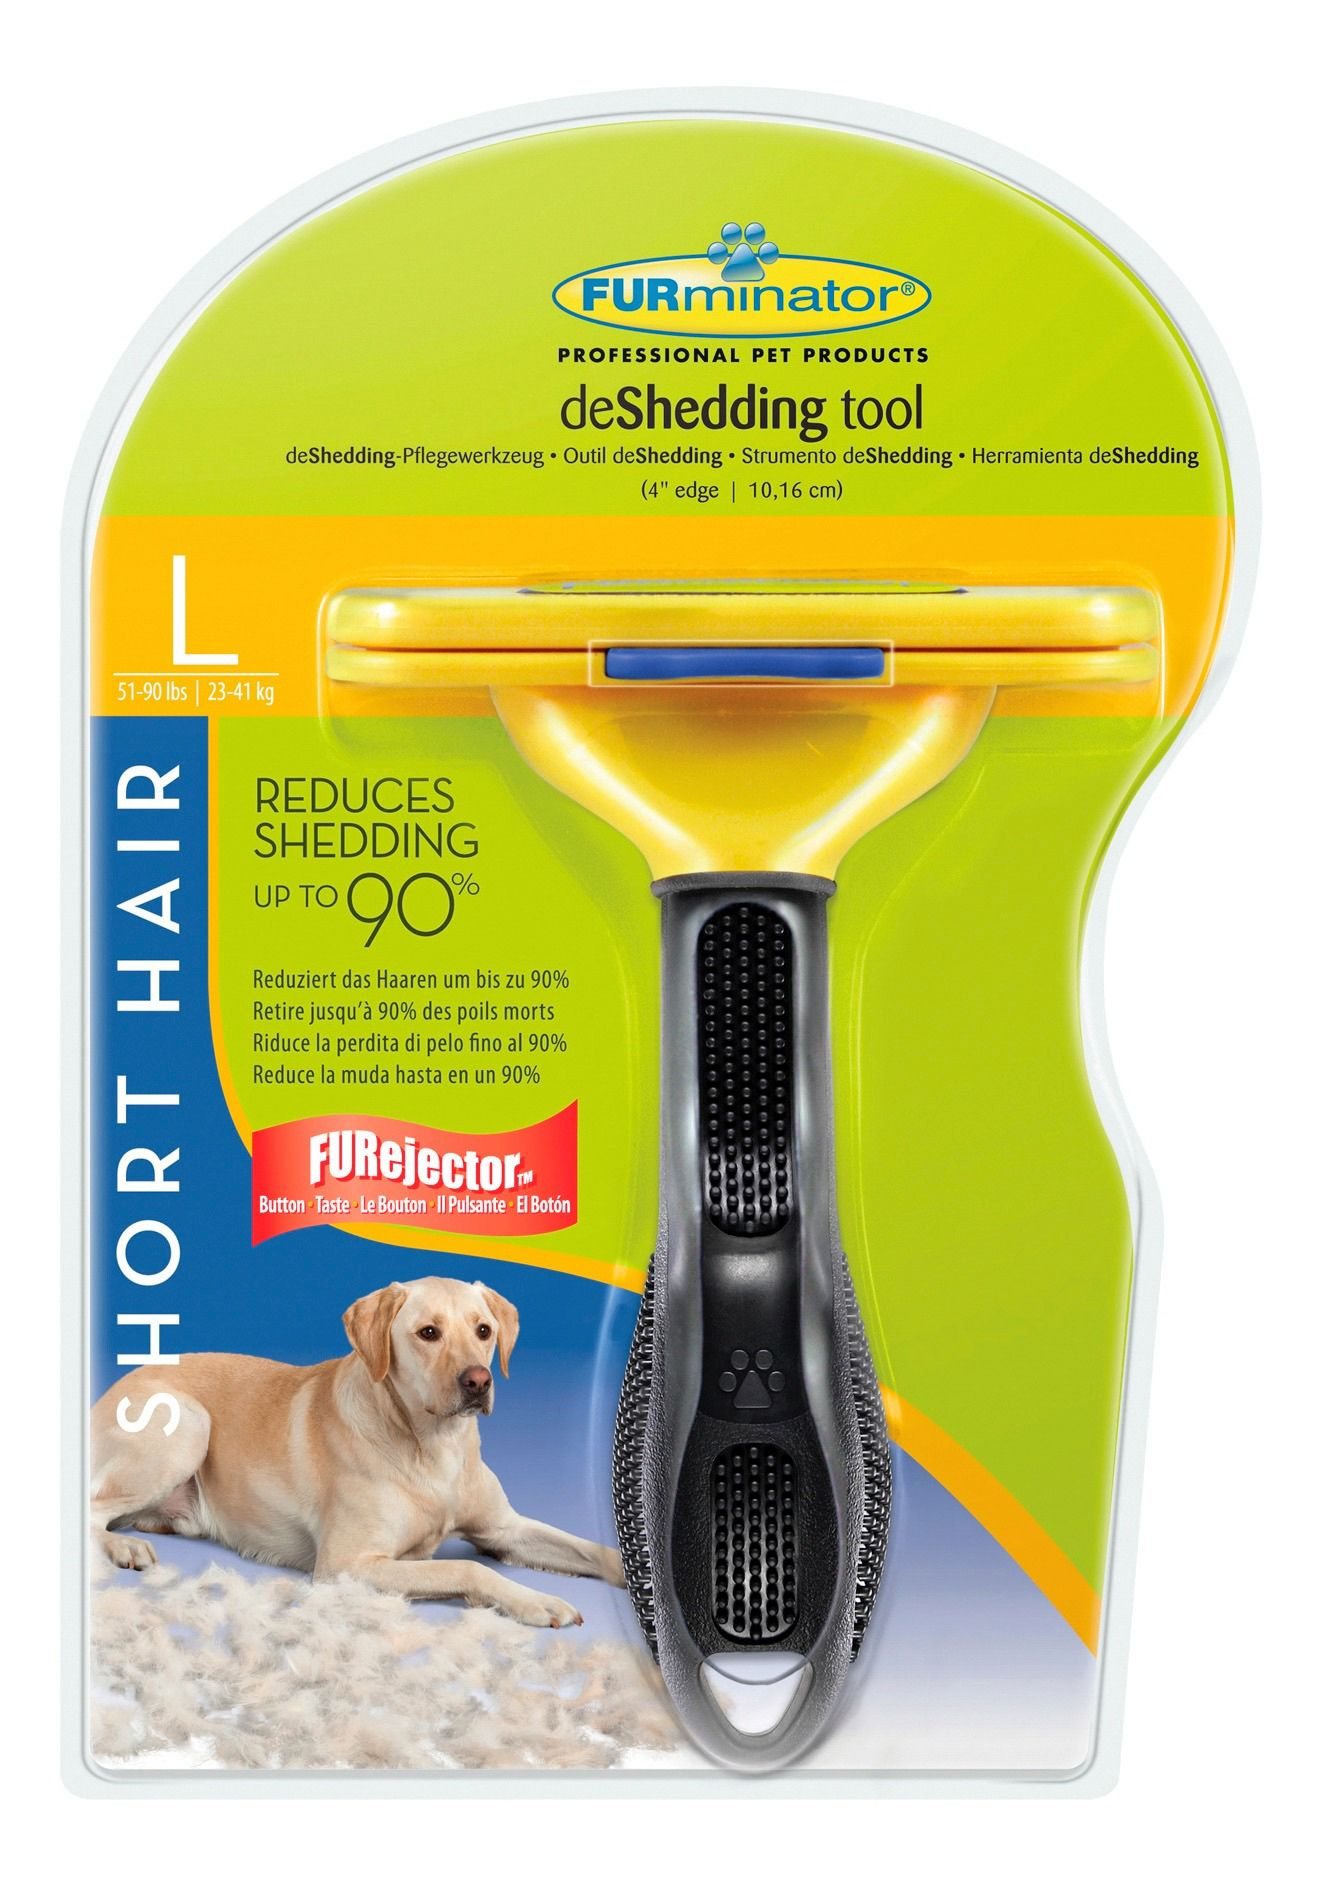 FURMINATOR Hundepflegebürste »FURminator deShedding Werkzeug Kurzhaar L«